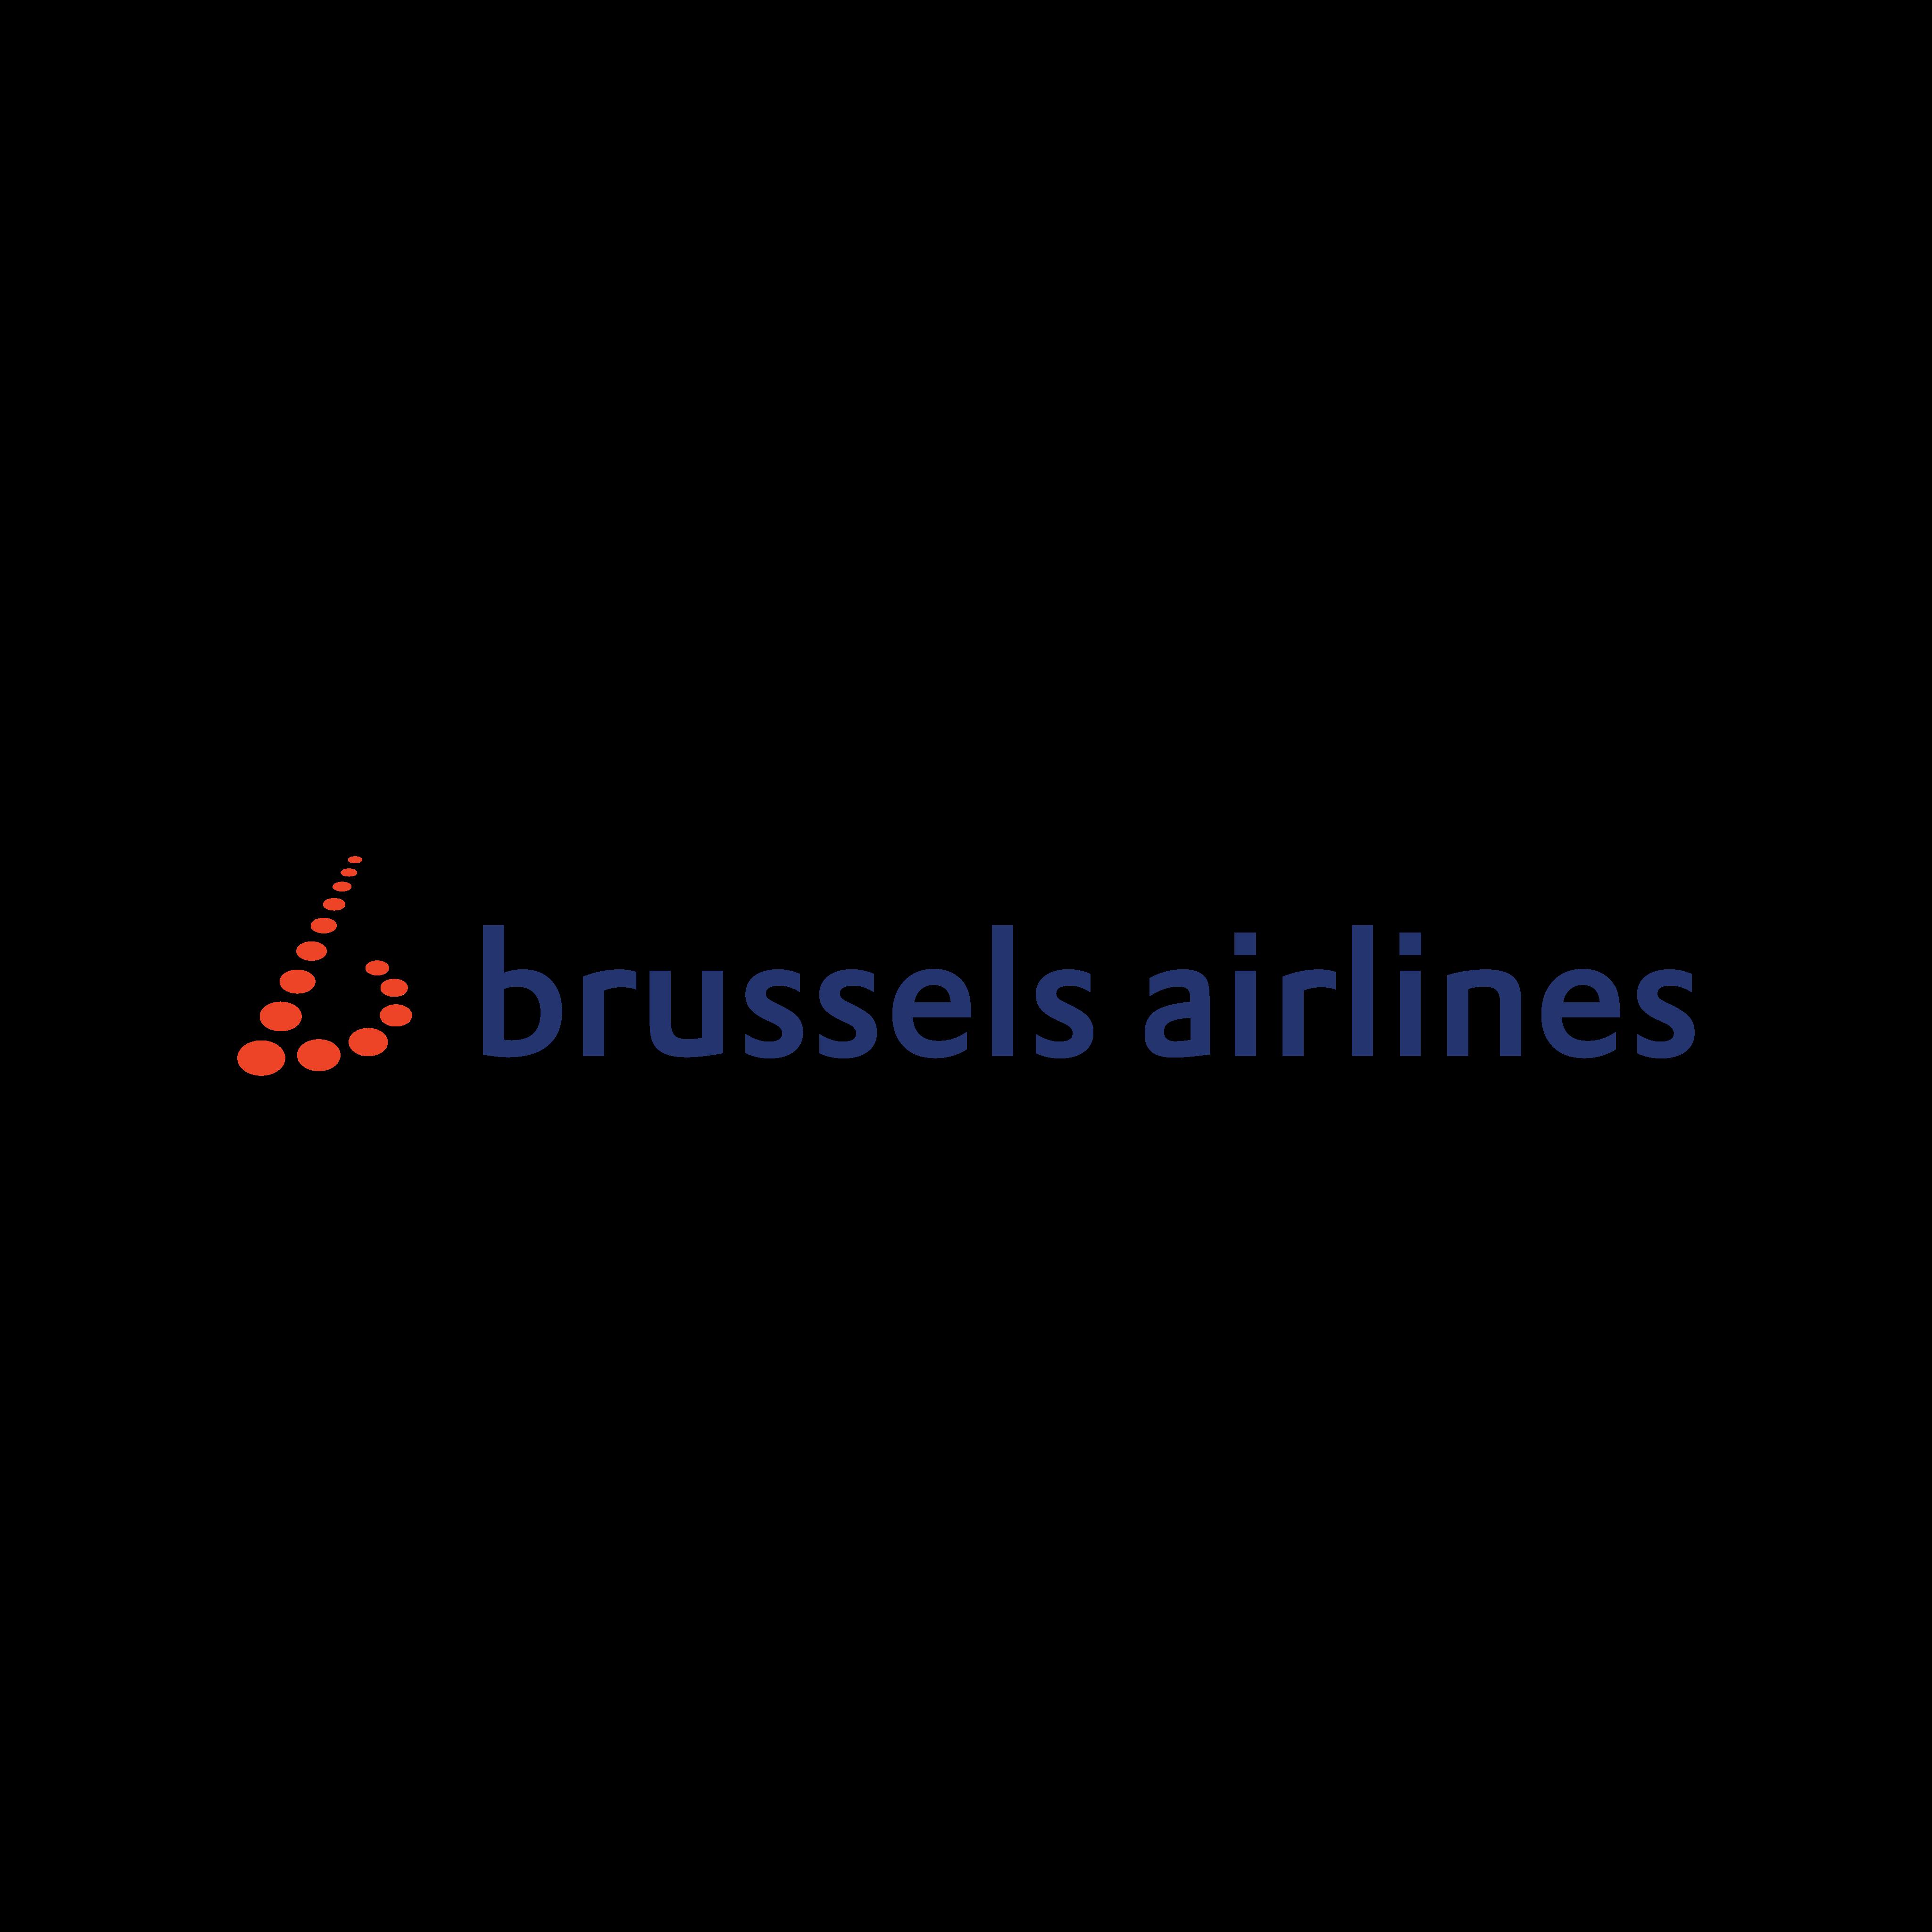 brussels airlines logo 0 - Brussels Airlines Logo